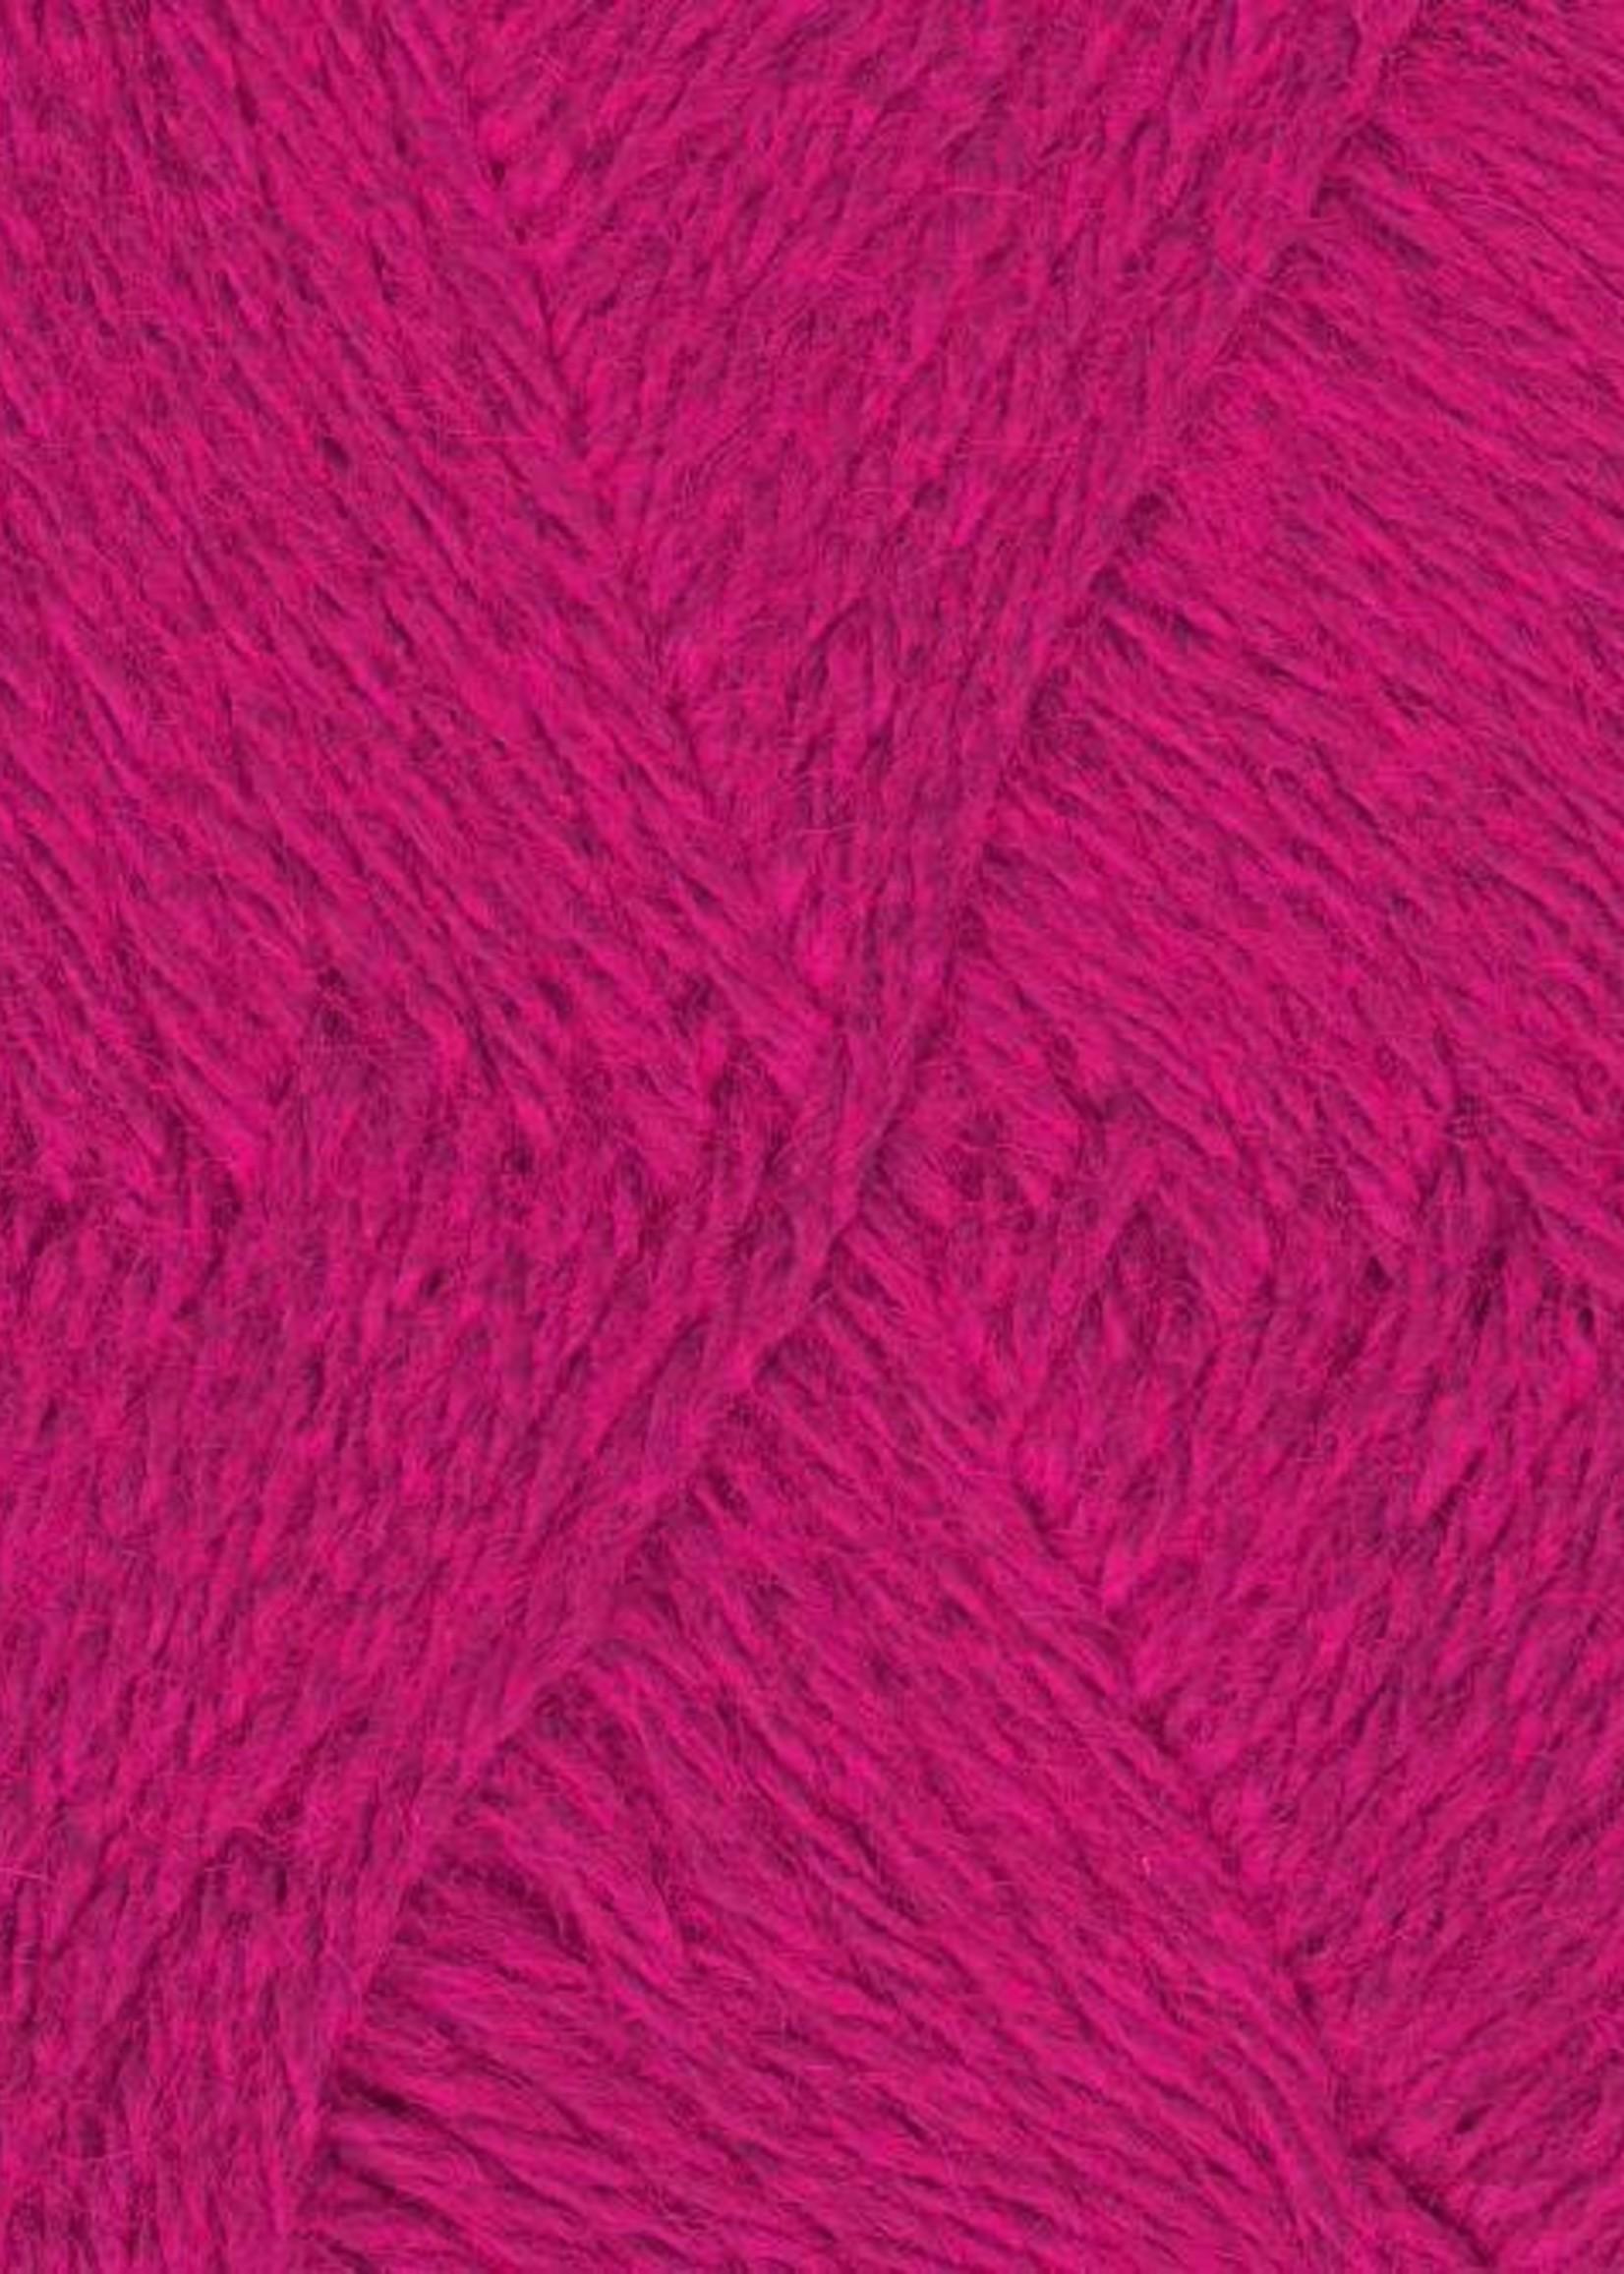 Knitting Fever KFI Collection Teenie Weenie Wool - Fuchsia